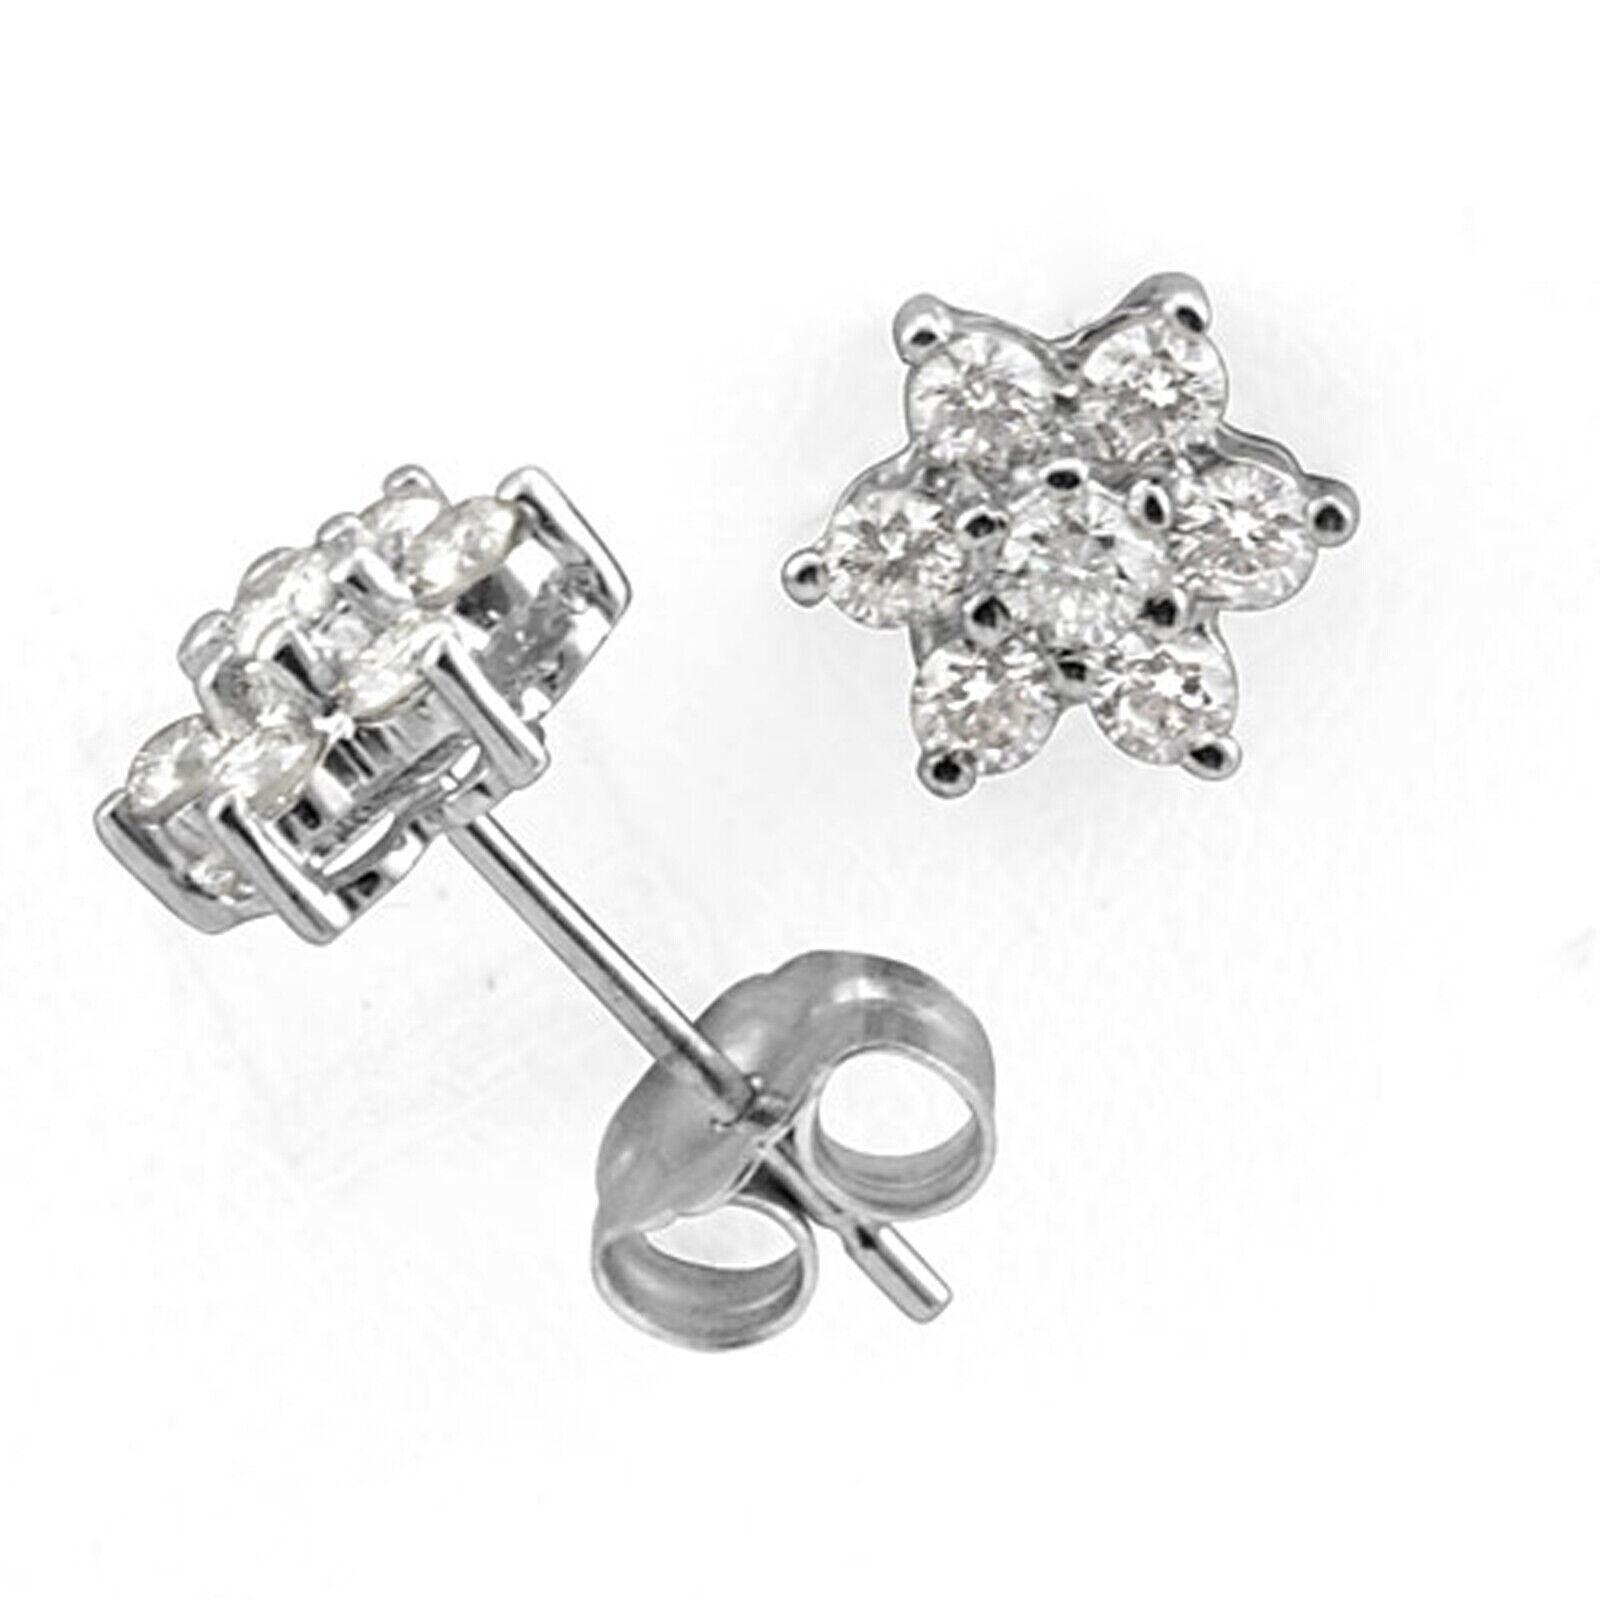 165b994b2f04a Diamond Round Ct 0.50 F-G Natural White gold 14k Earring Women's ...